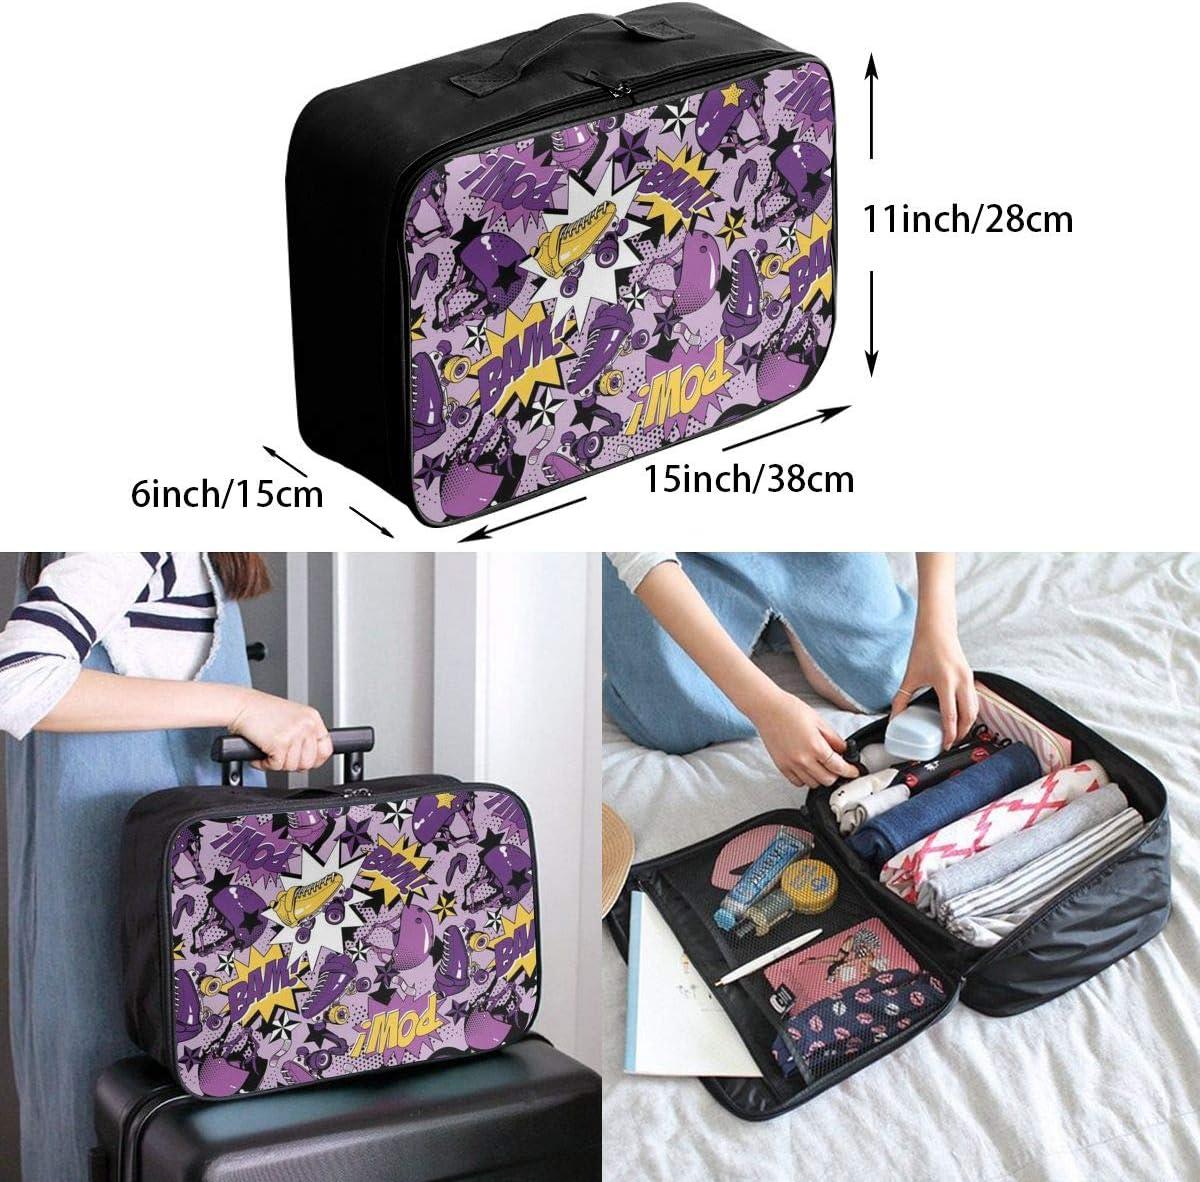 Roller Skate Travel Carry-on Luggage Weekender Bag Overnight Tote Flight Duffel In Trolley Handle